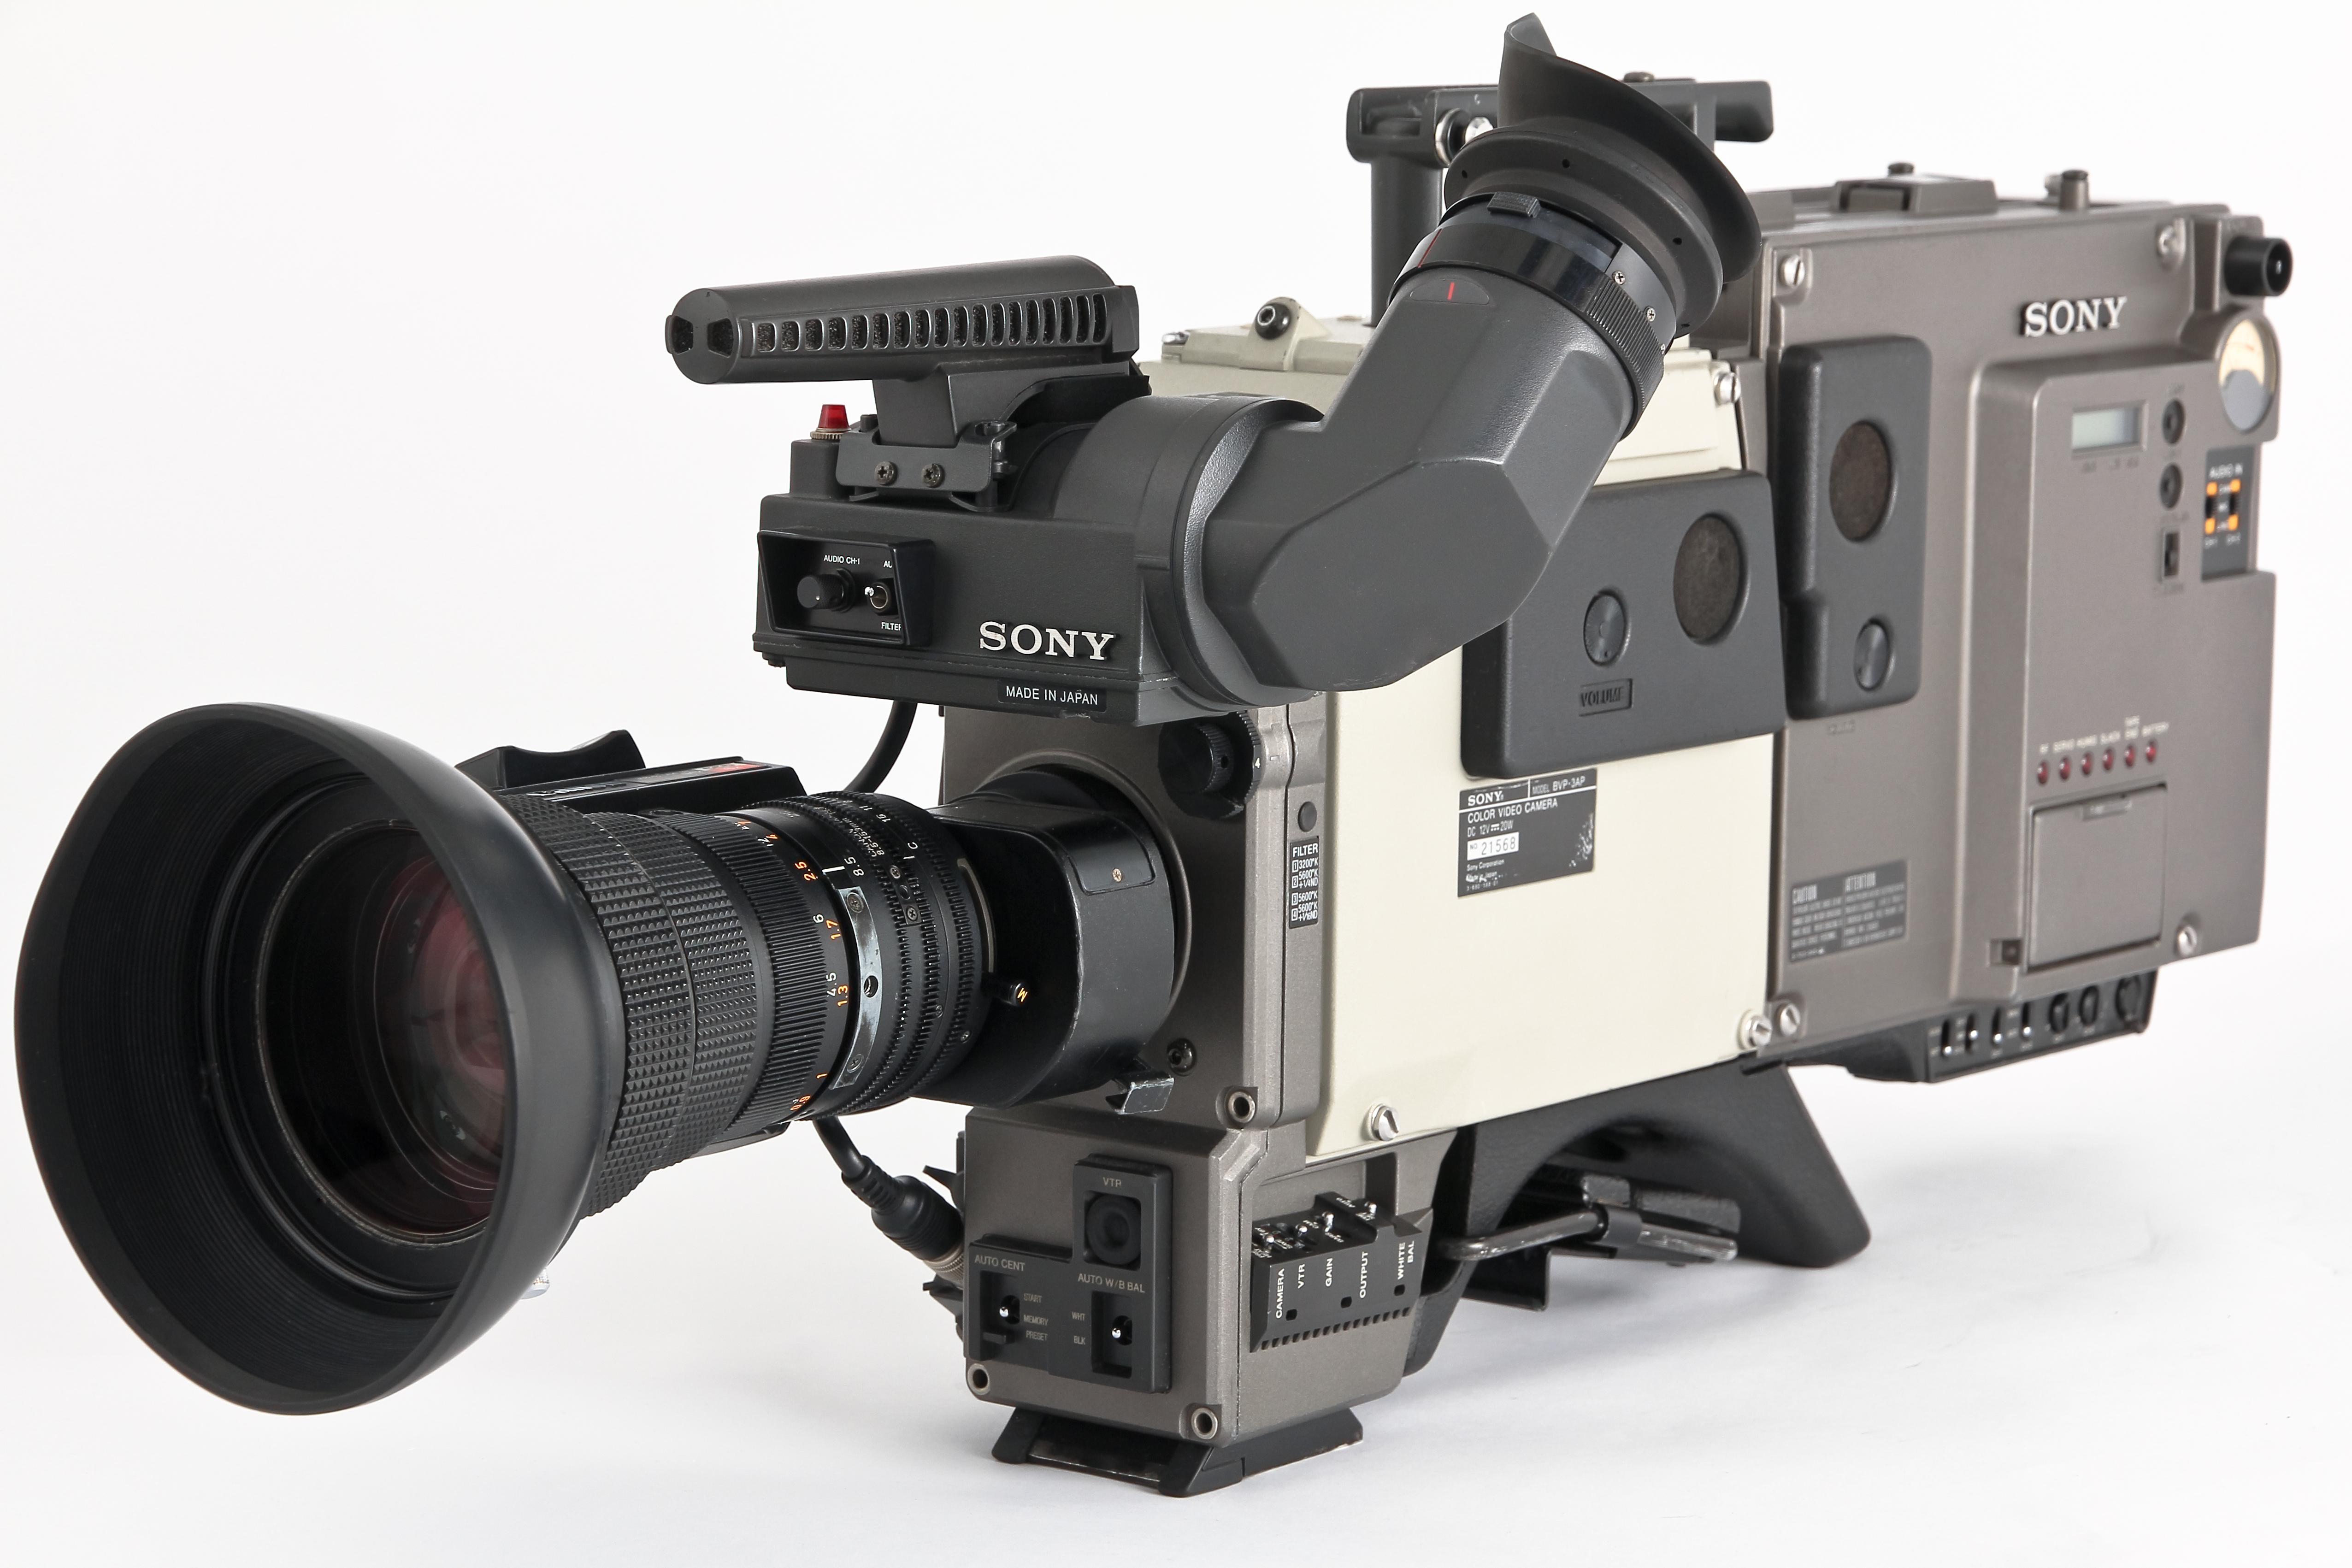 Sony BVP-3AP - BVV-1 - 2